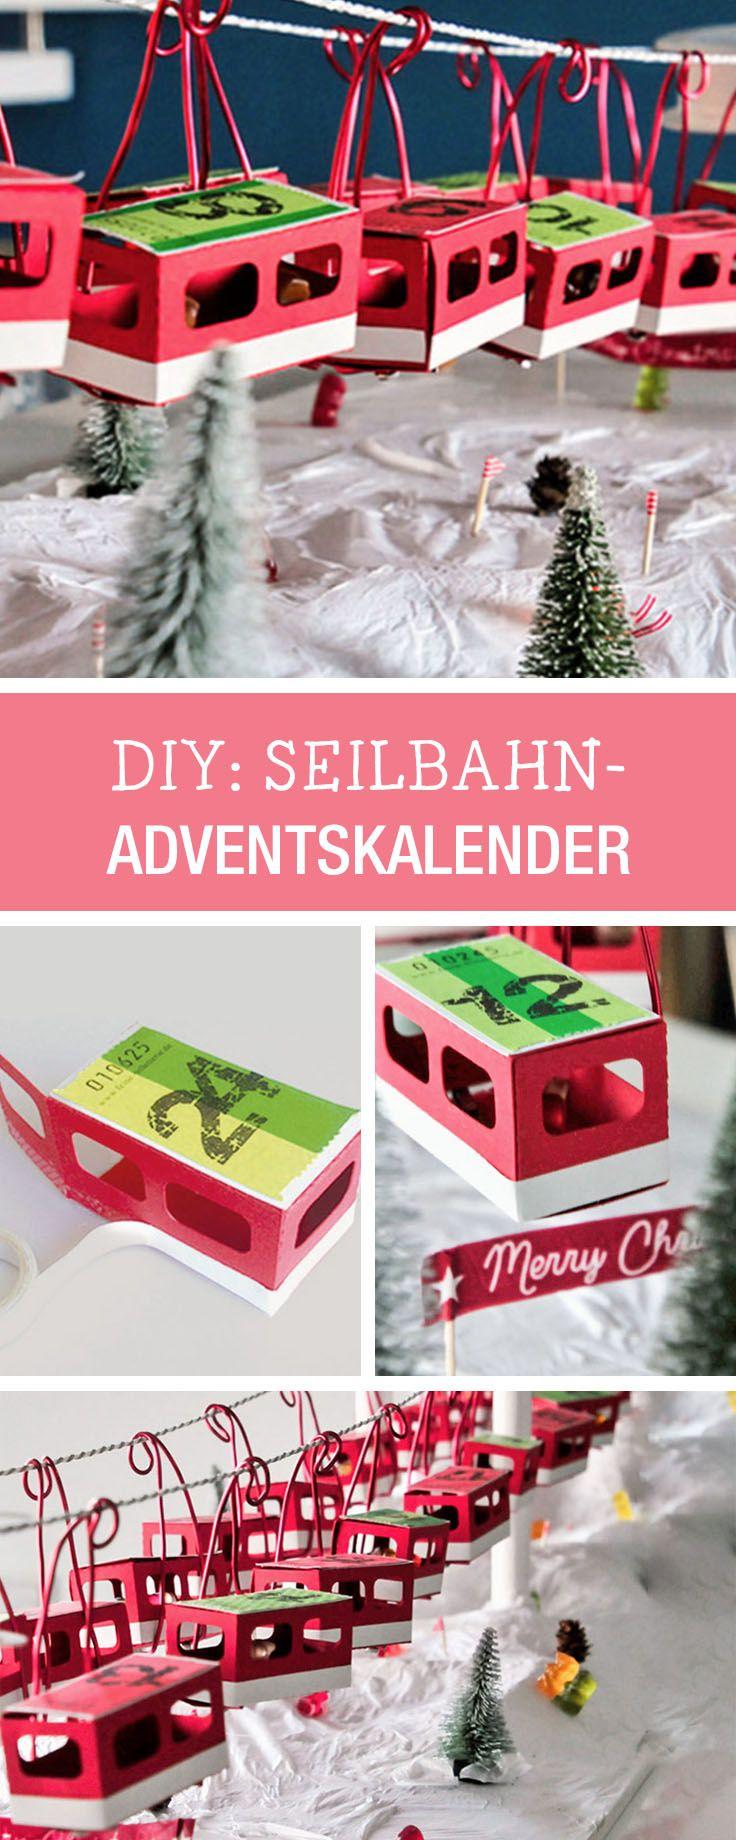 Elegant Einmaliger Adventskalender Mit Gondeln Einer Seilbahn / Craft An Advents  Calendar Via DaWanda.com